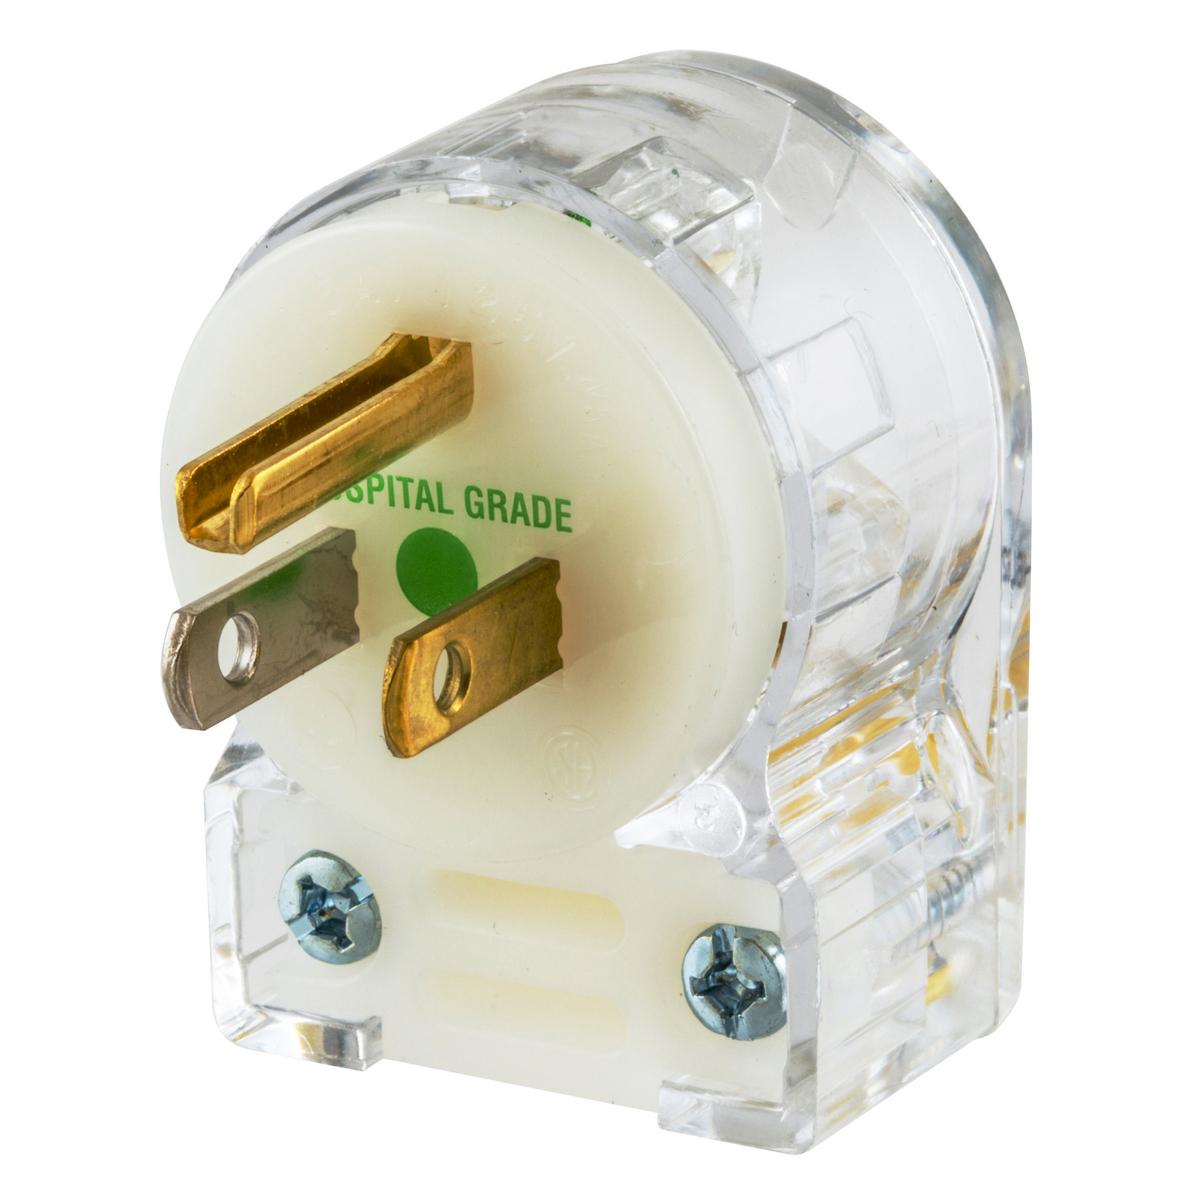 Hubbell HBL8215CAT 15 Amp 125 Volt 2-Pole 3-Wire NEMA 5-15P Straight Blade Angle Plug